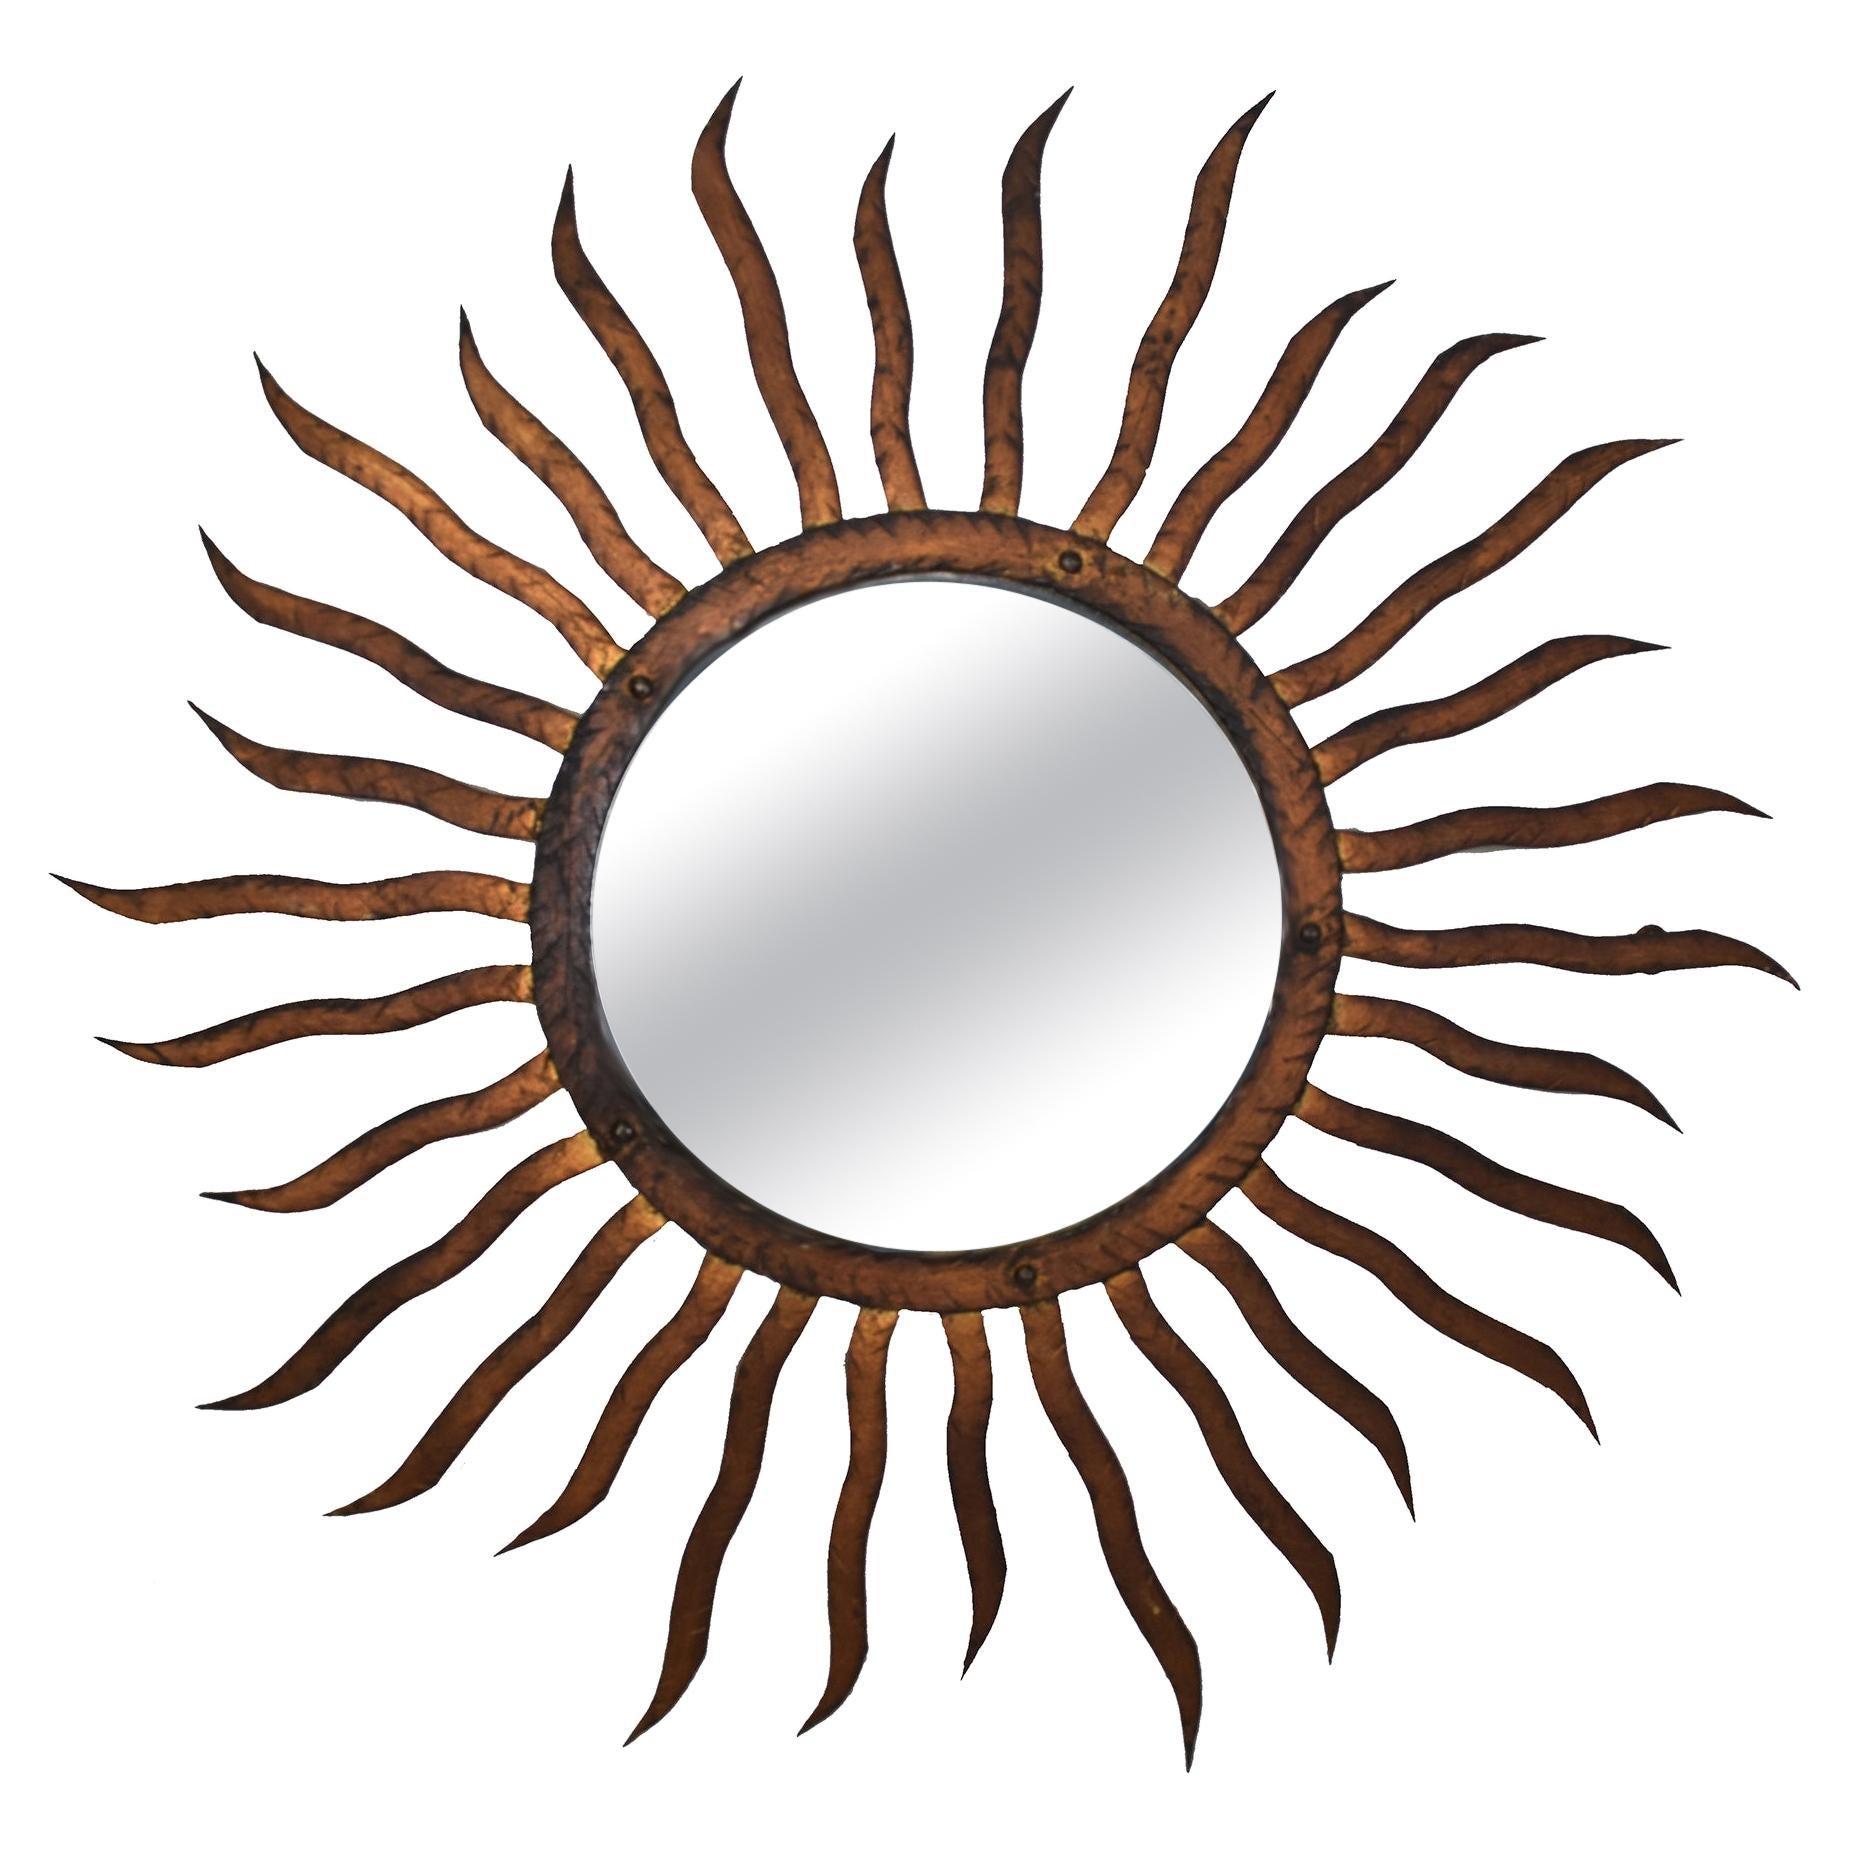 Gilded Iron Sun or Soleil Mirror